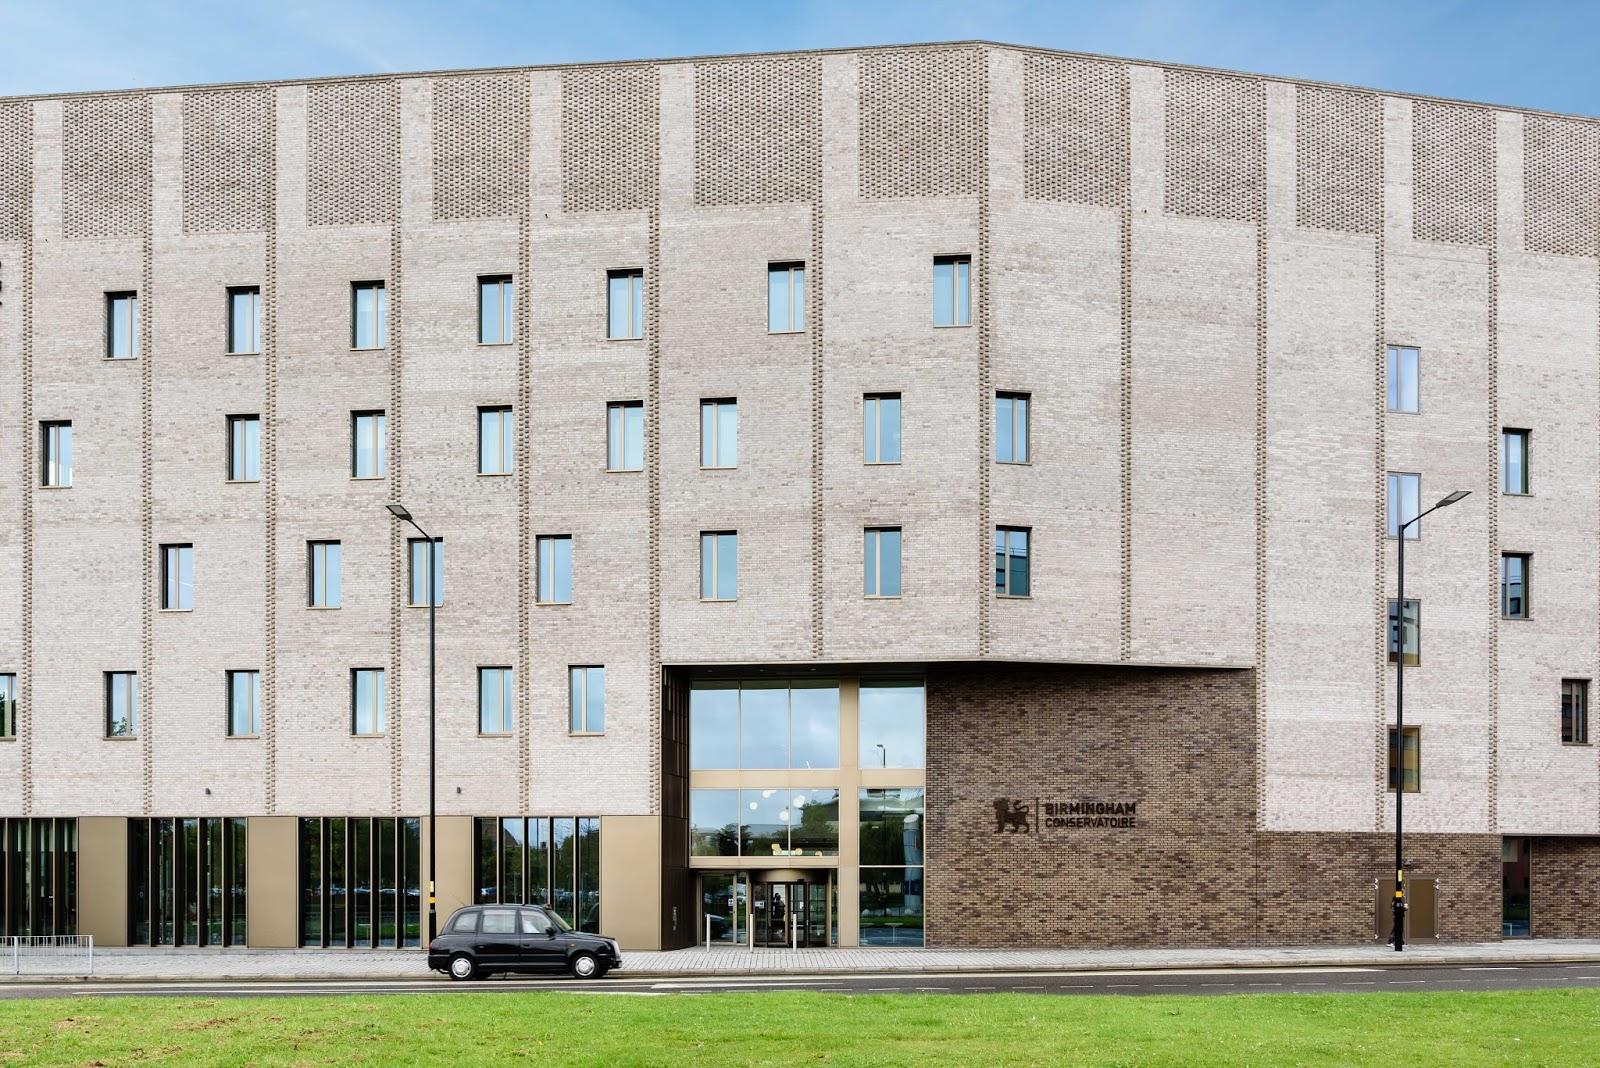 Birmingham Conservatoire New Building